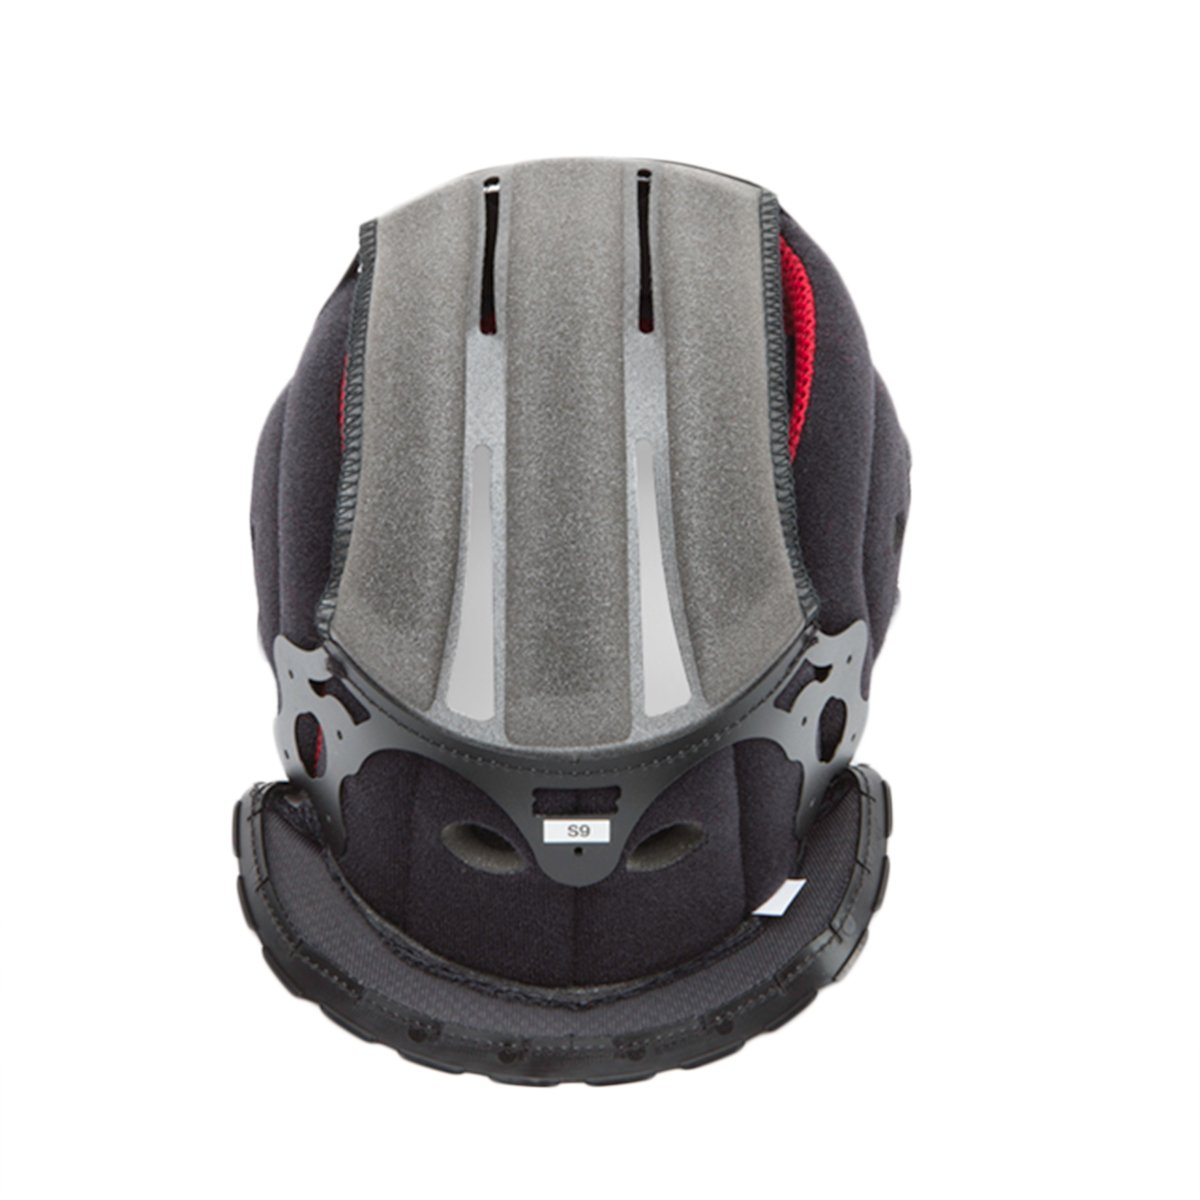 Shoei X-14 Type-I Center Pad Side S5 Street Bike Racing Motorcycle Helmet Accessories - Black One Size